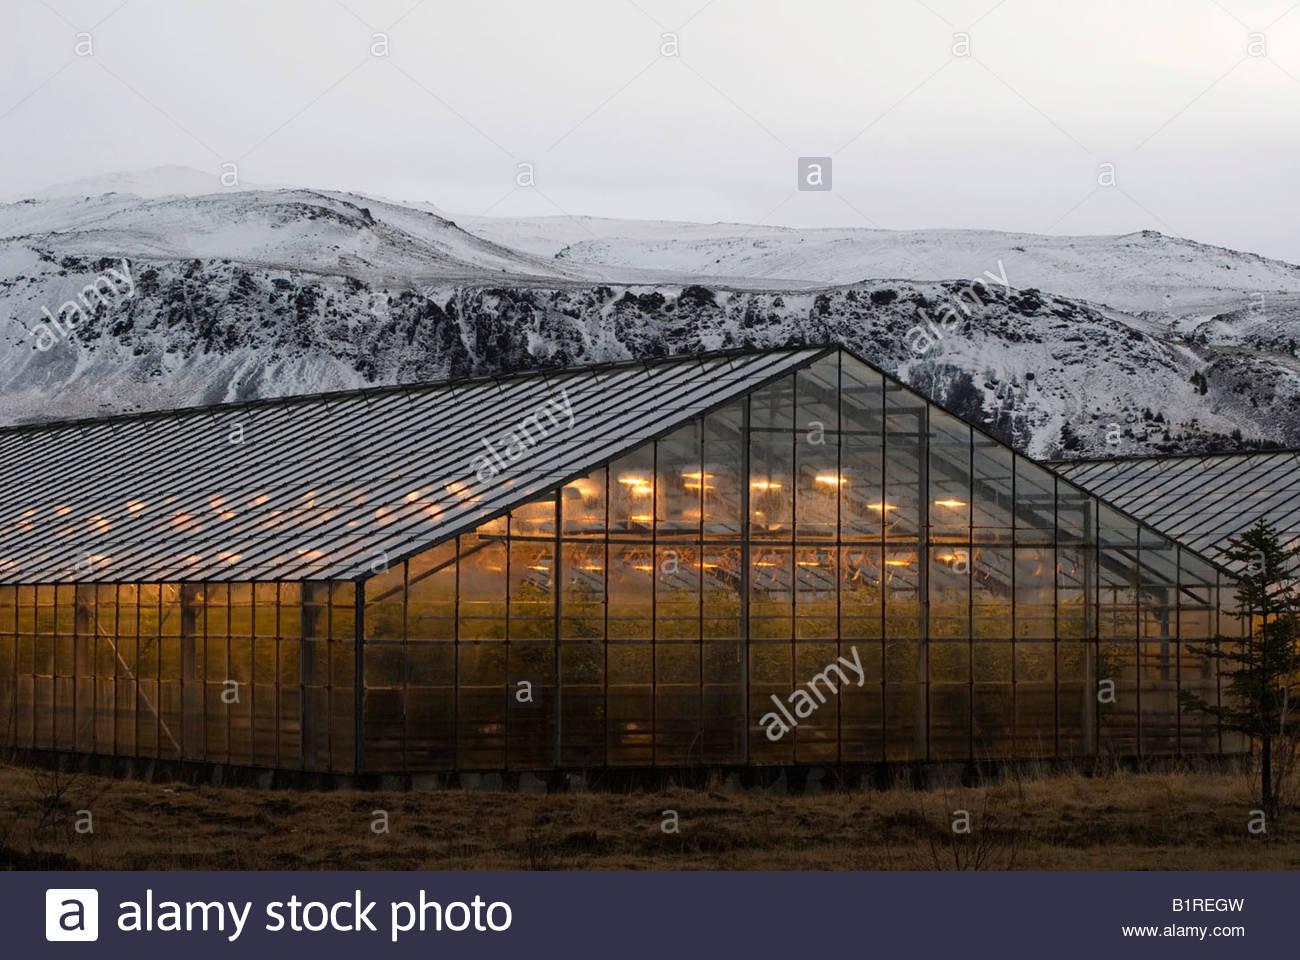 Greenhouses in Hveragerdi, local warm springs keep it heated, Iceland, Europe - Stock Image